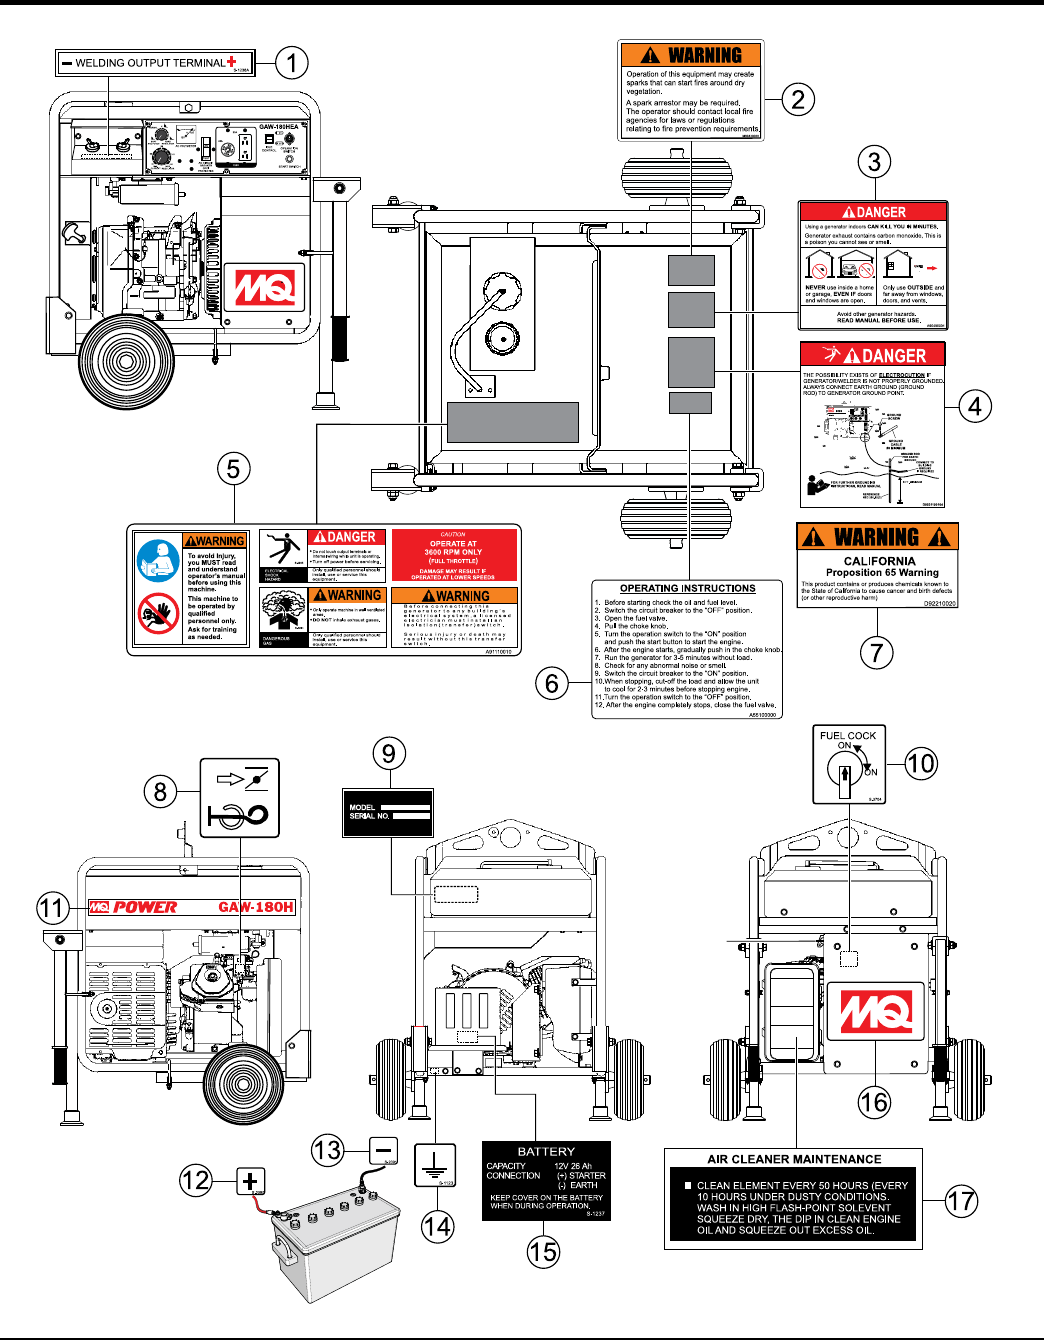 Generators And Welders Gaw180he Welder Series Rev 0 Manual Data Id Welding Generator Diagram Page 46 Gaw180 Operation Parts 06 02 15